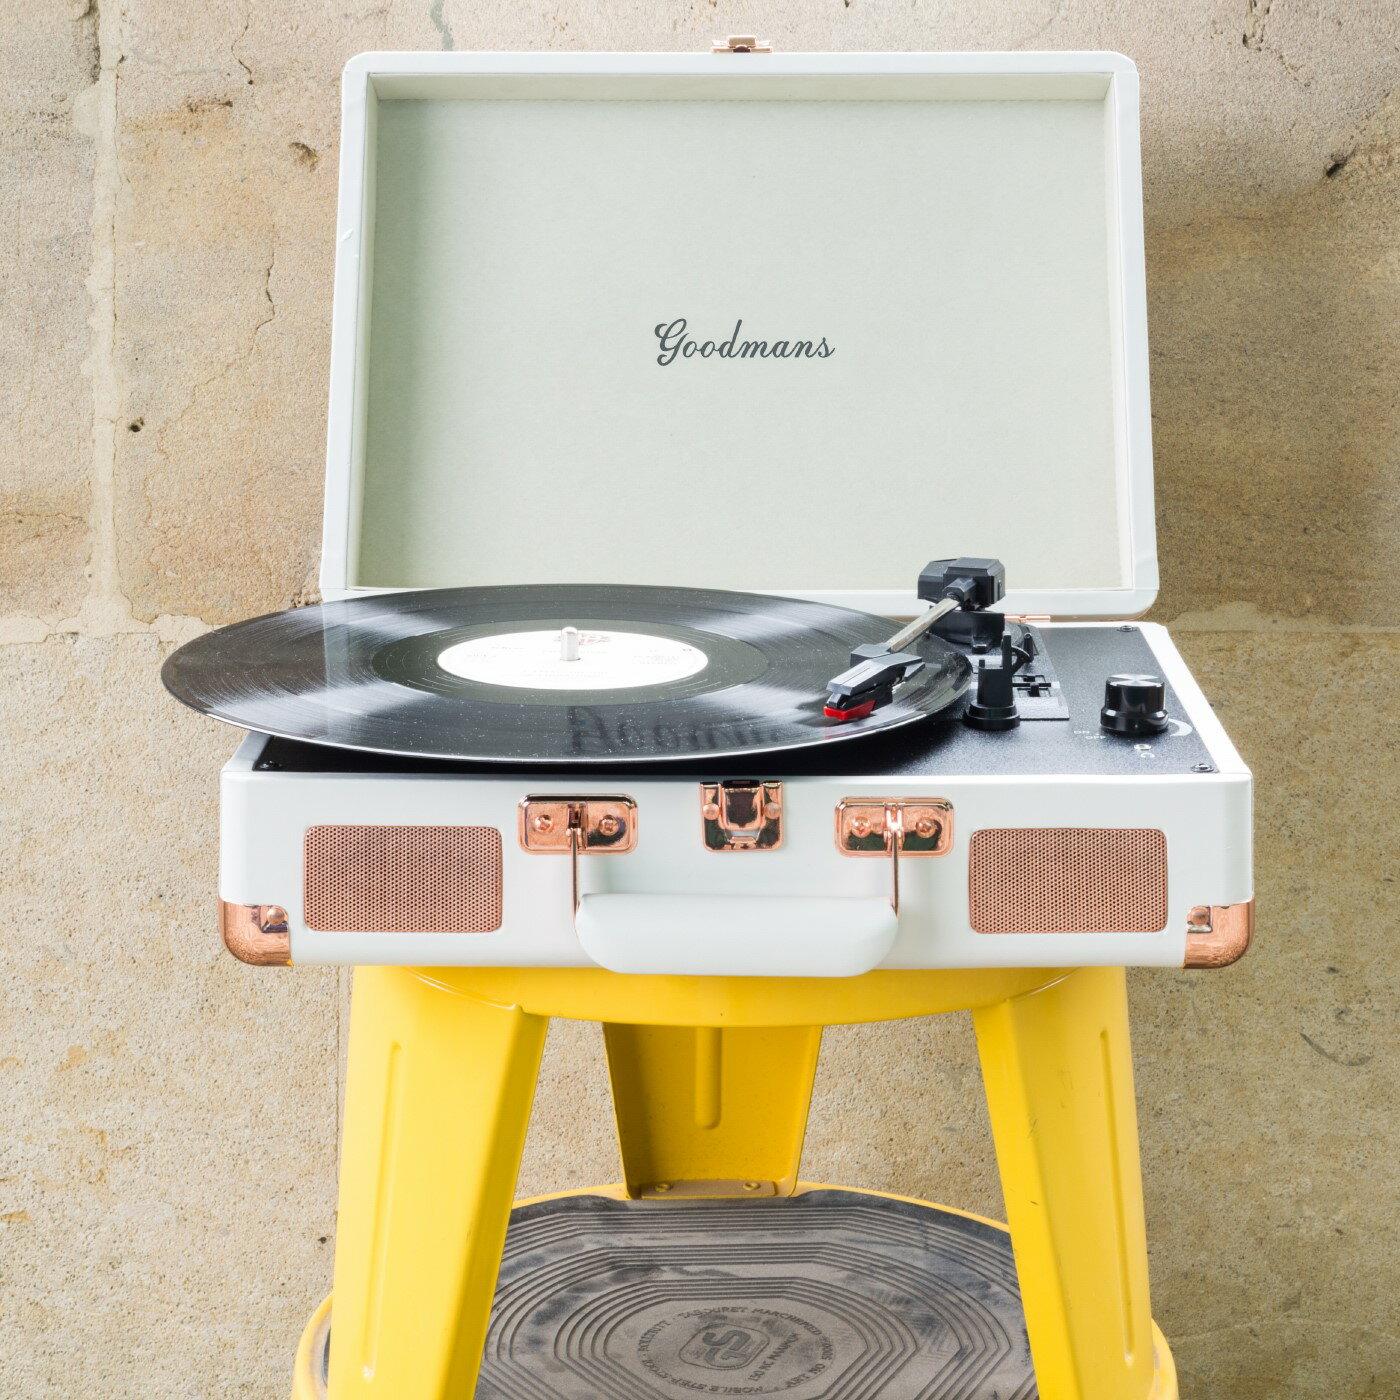 Goodmans Ealing Turntable 英國手提箱黑膠唱片機 1